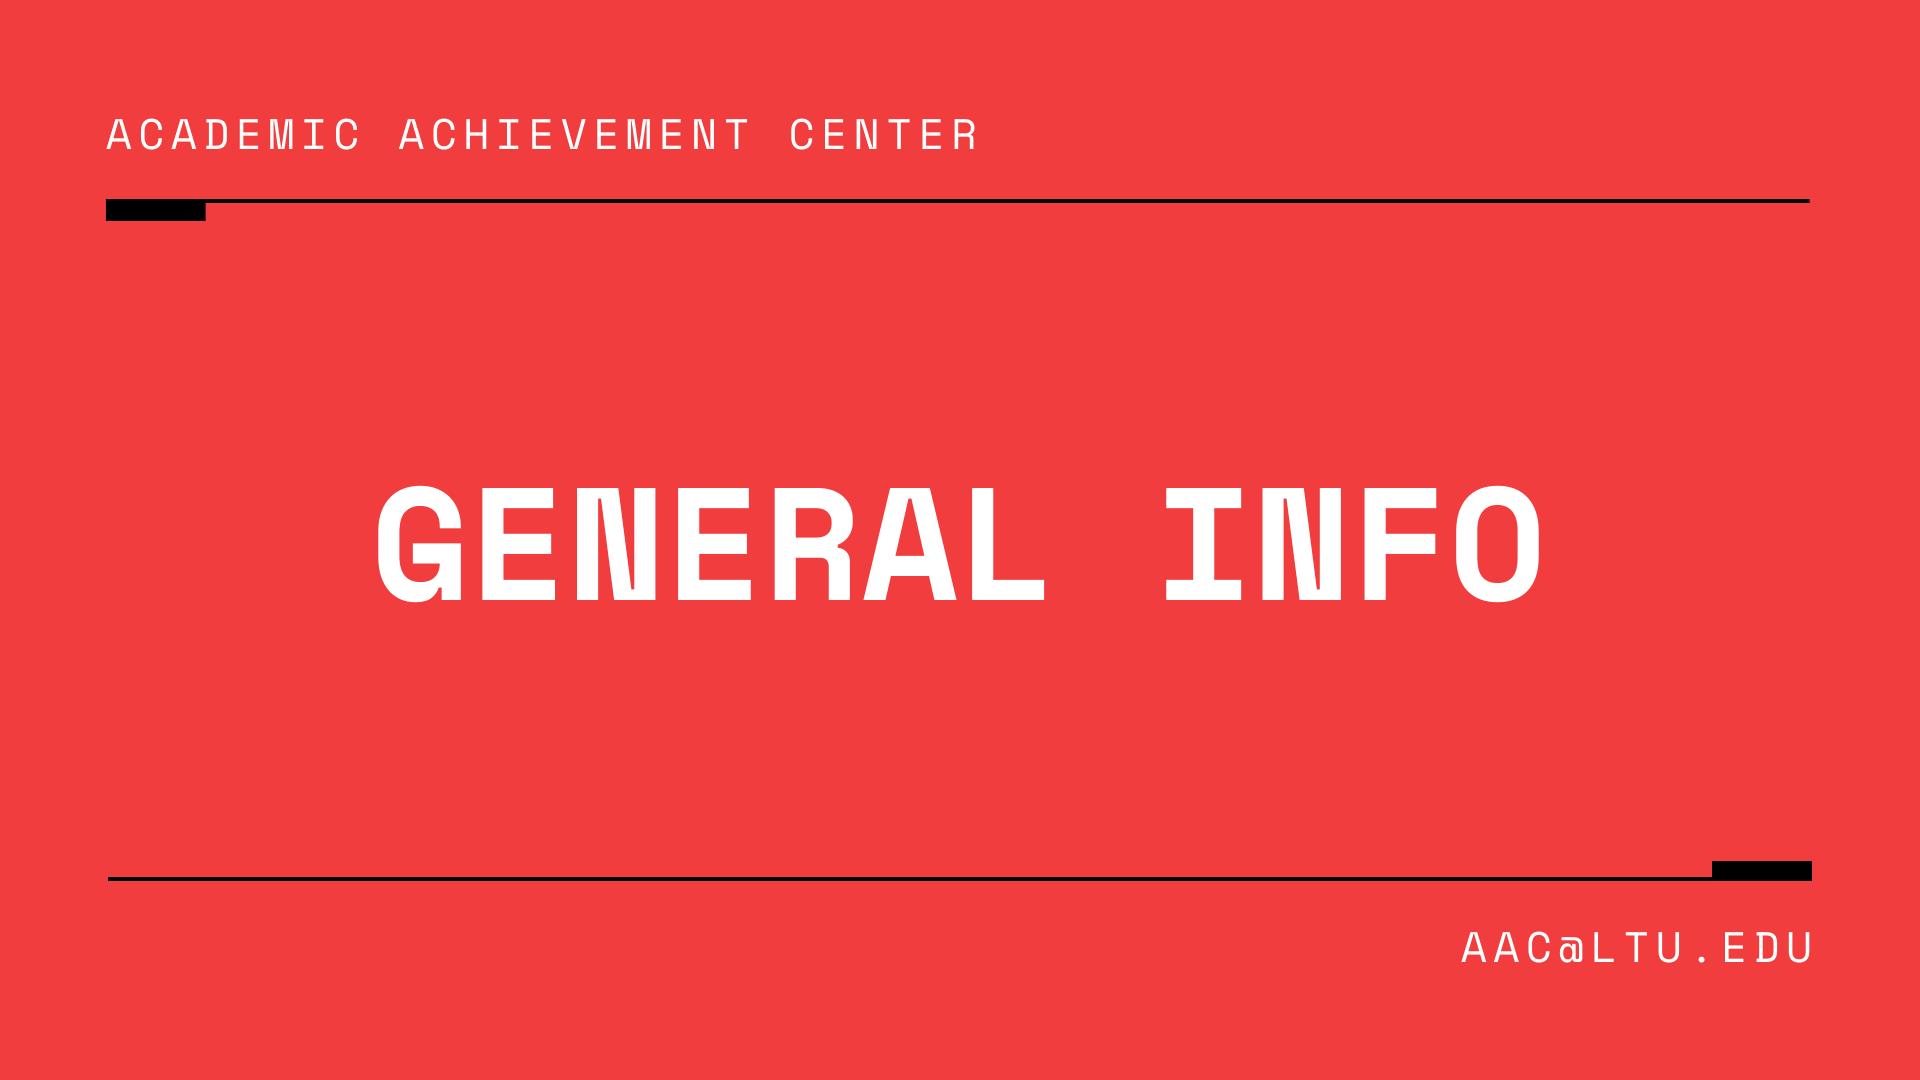 Academic Achievement Center General Info